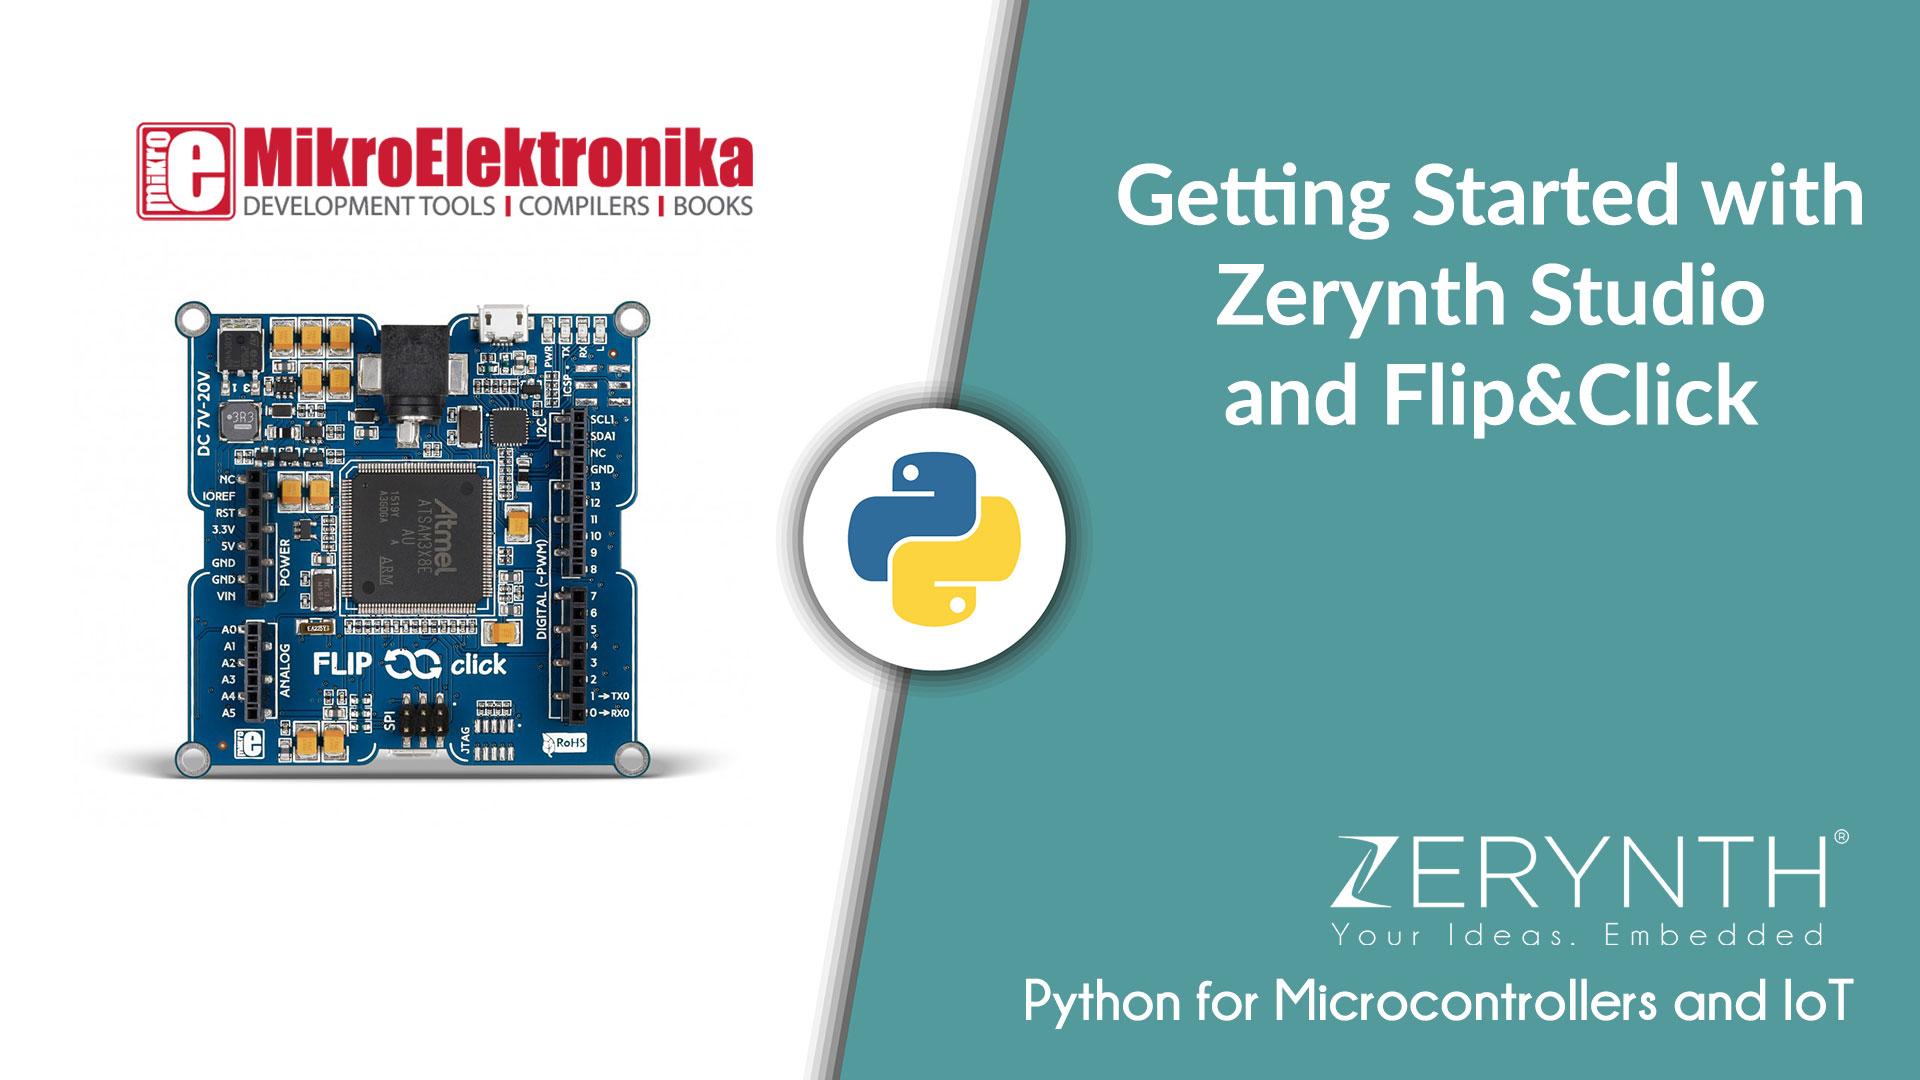 zerynth.com - Luigi F. Cerfeda - Video Tutorial: Python on Flip&Click via Zerynth Studio